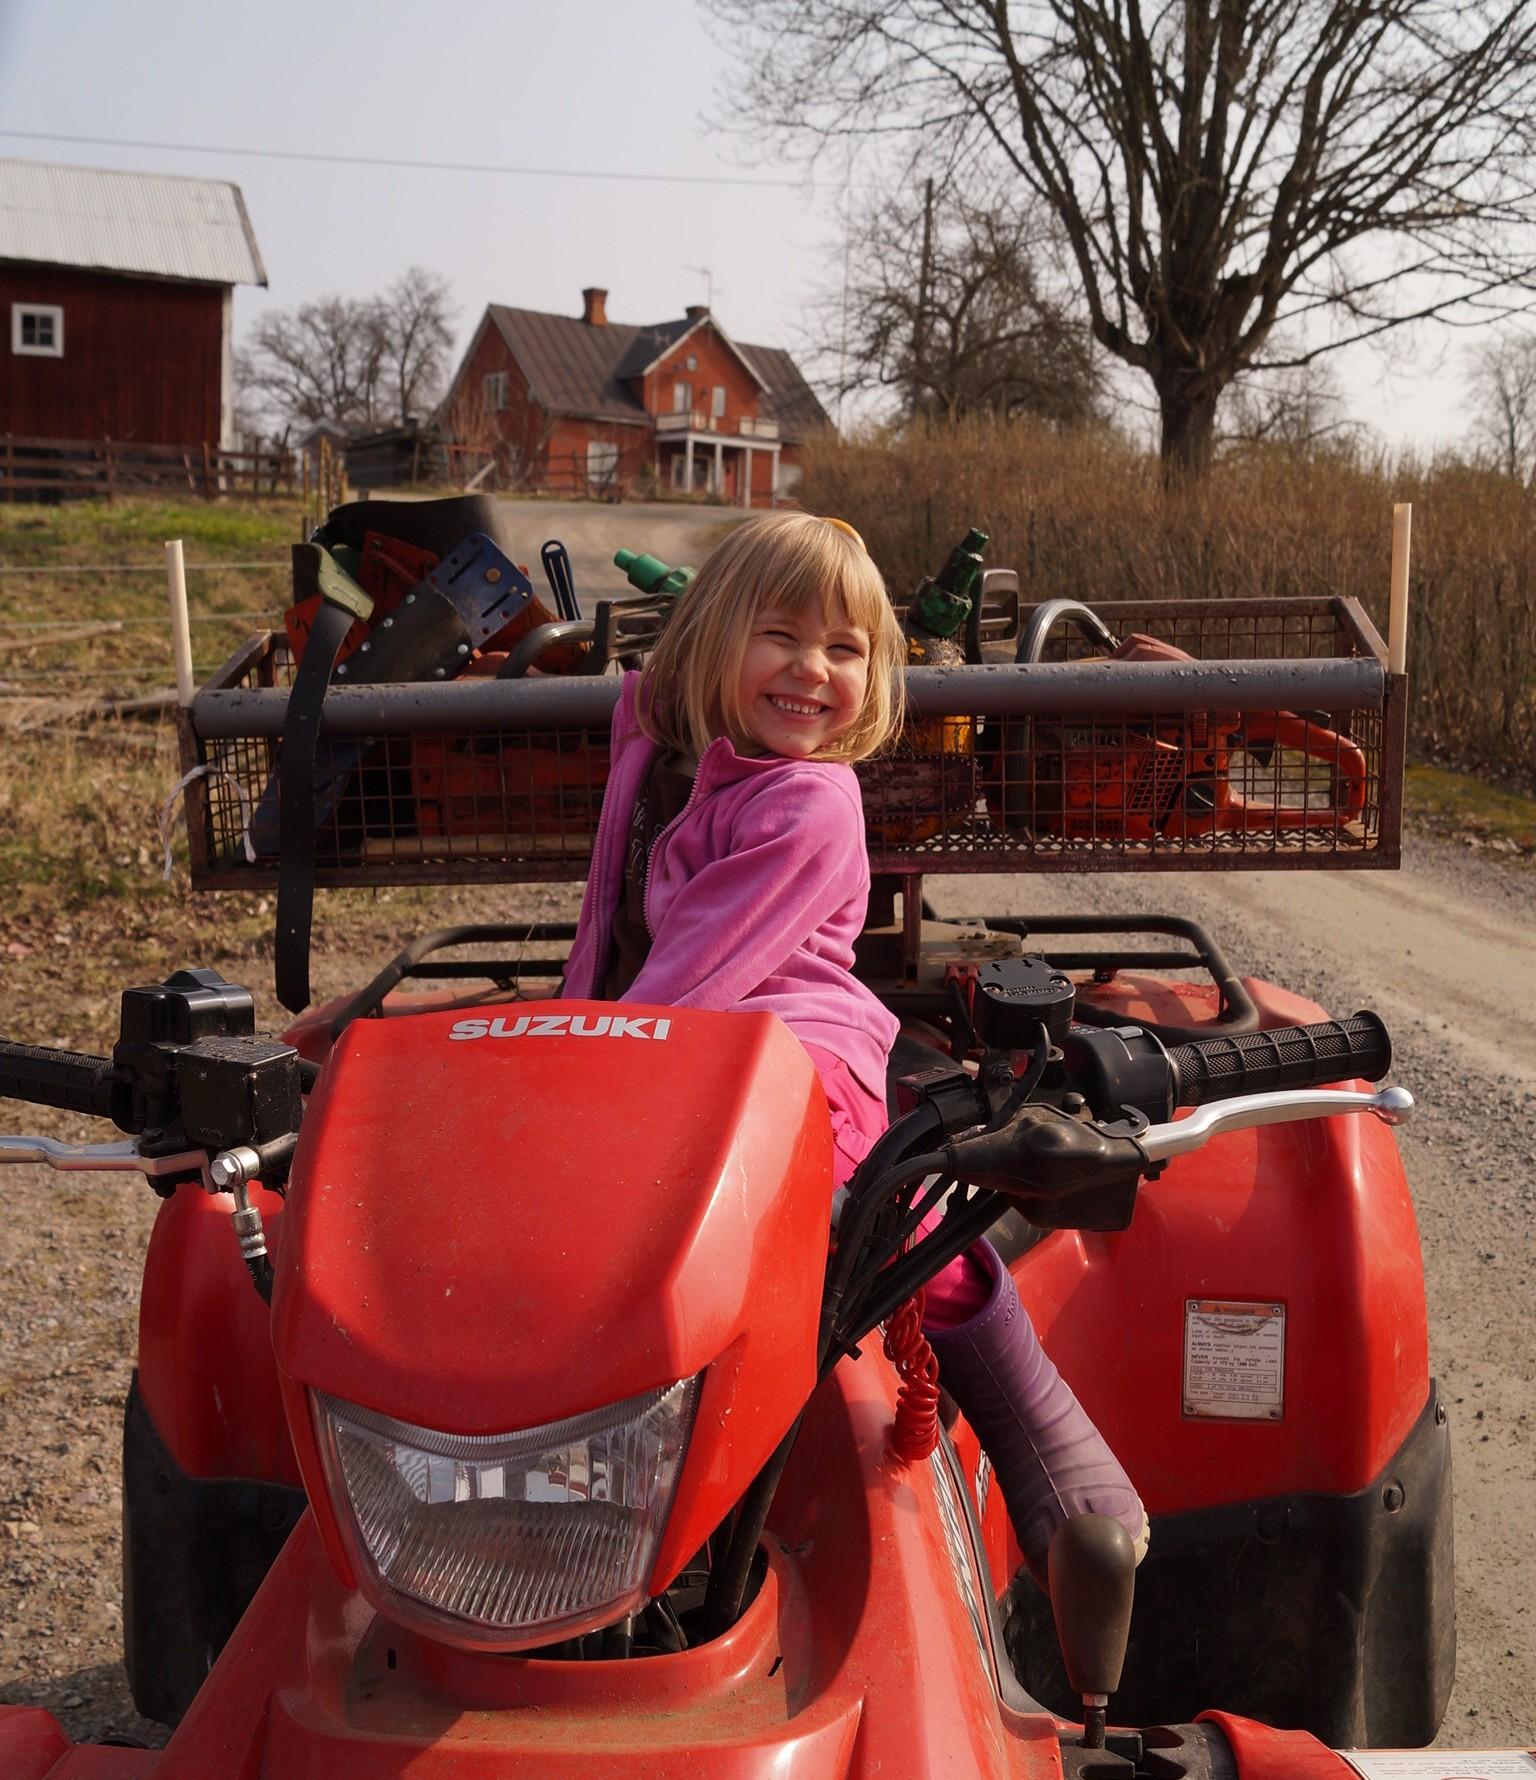 På fyrhjuling Foto: Anneli Uusitalo VackertNu